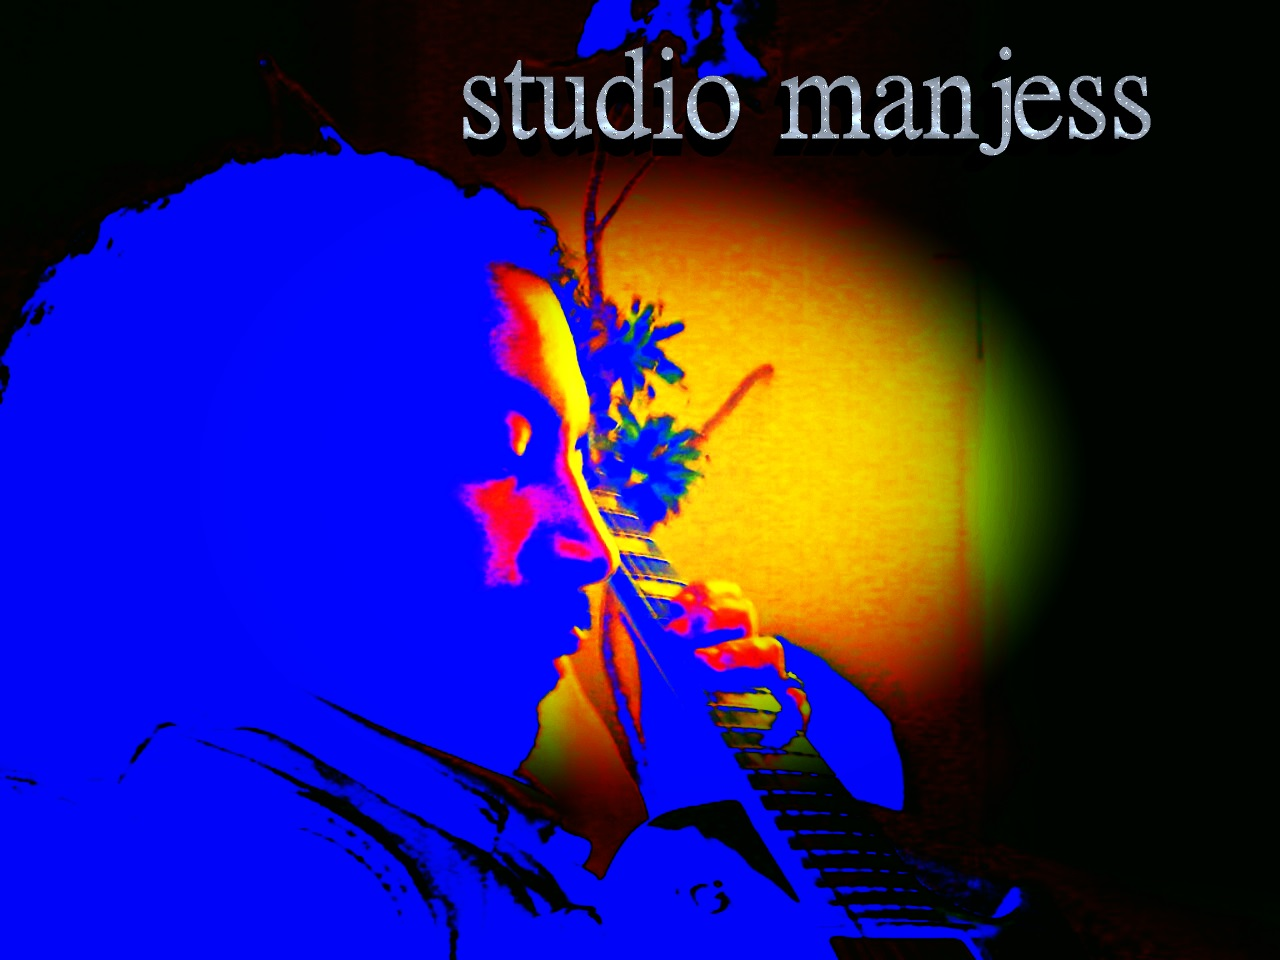 http://www.studiomanjess.com